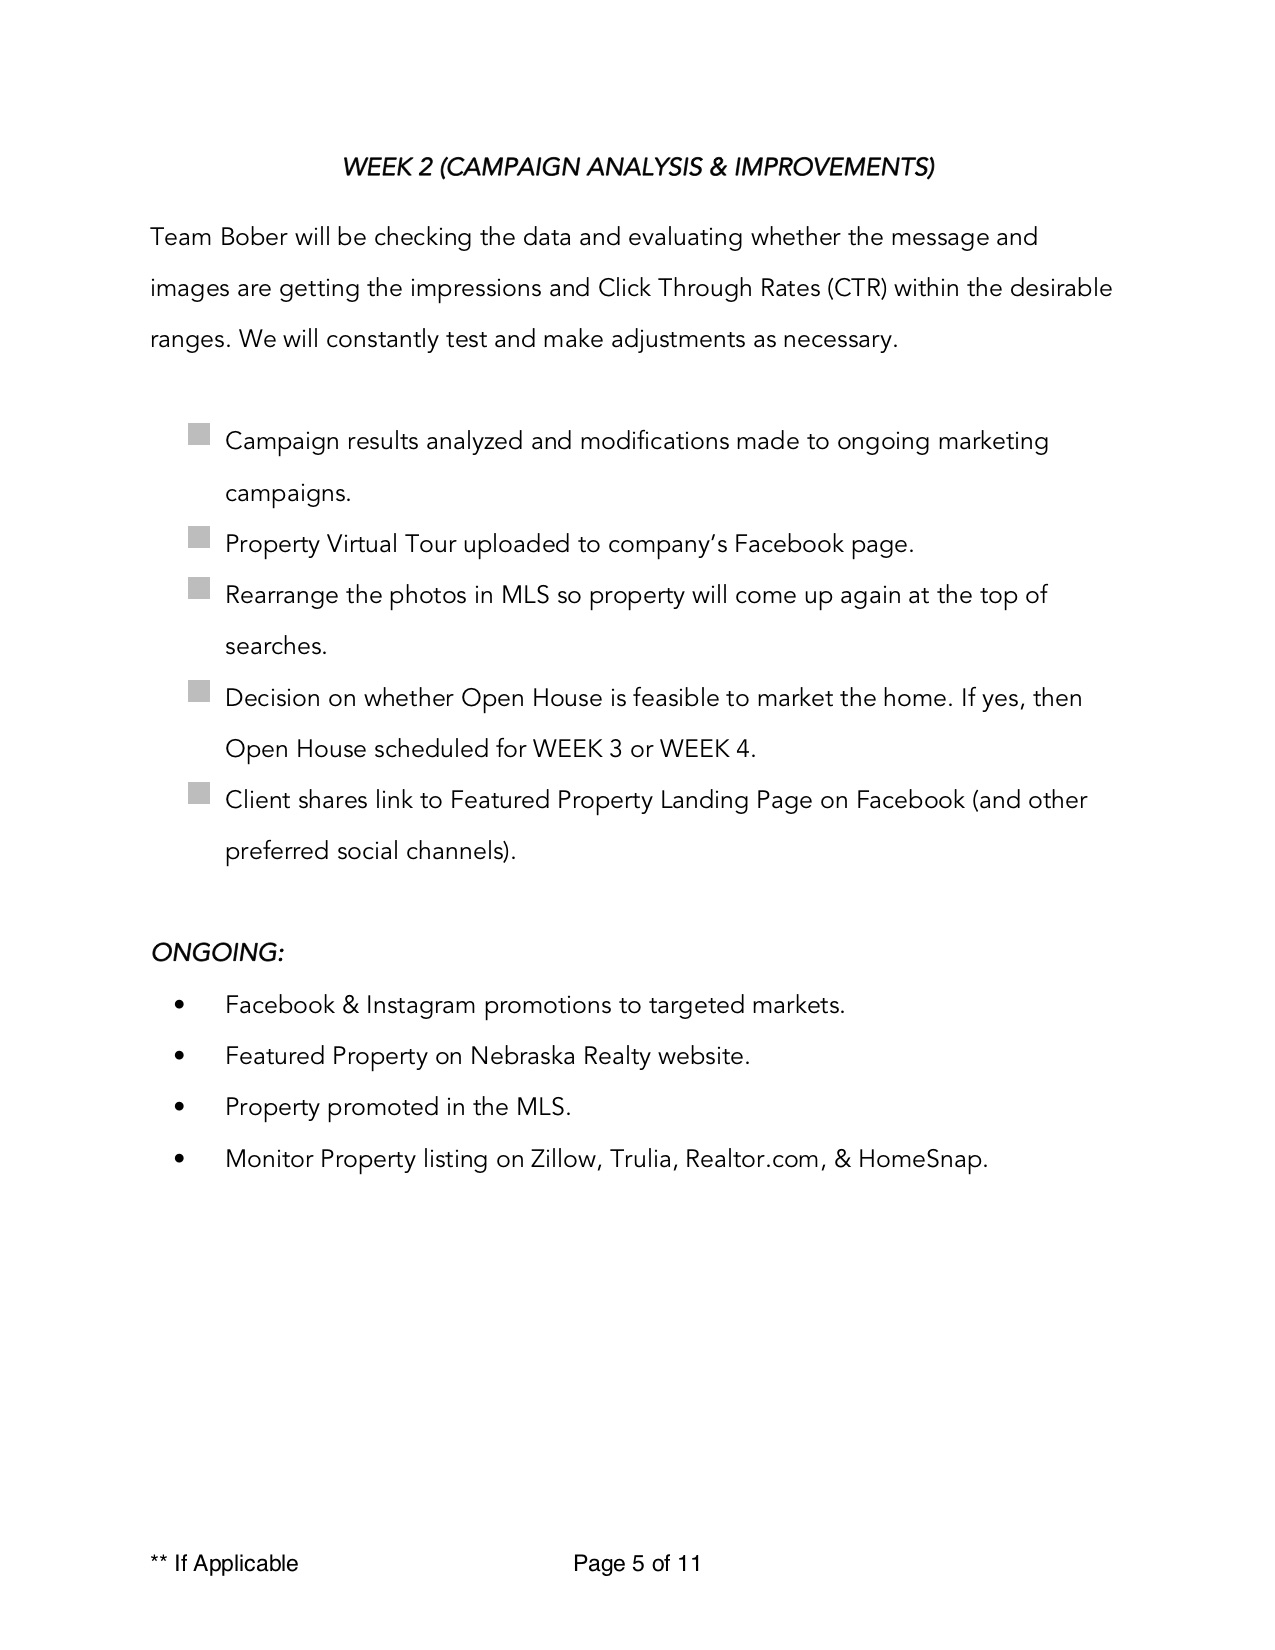 8 Week Marketing Plan5.jpg